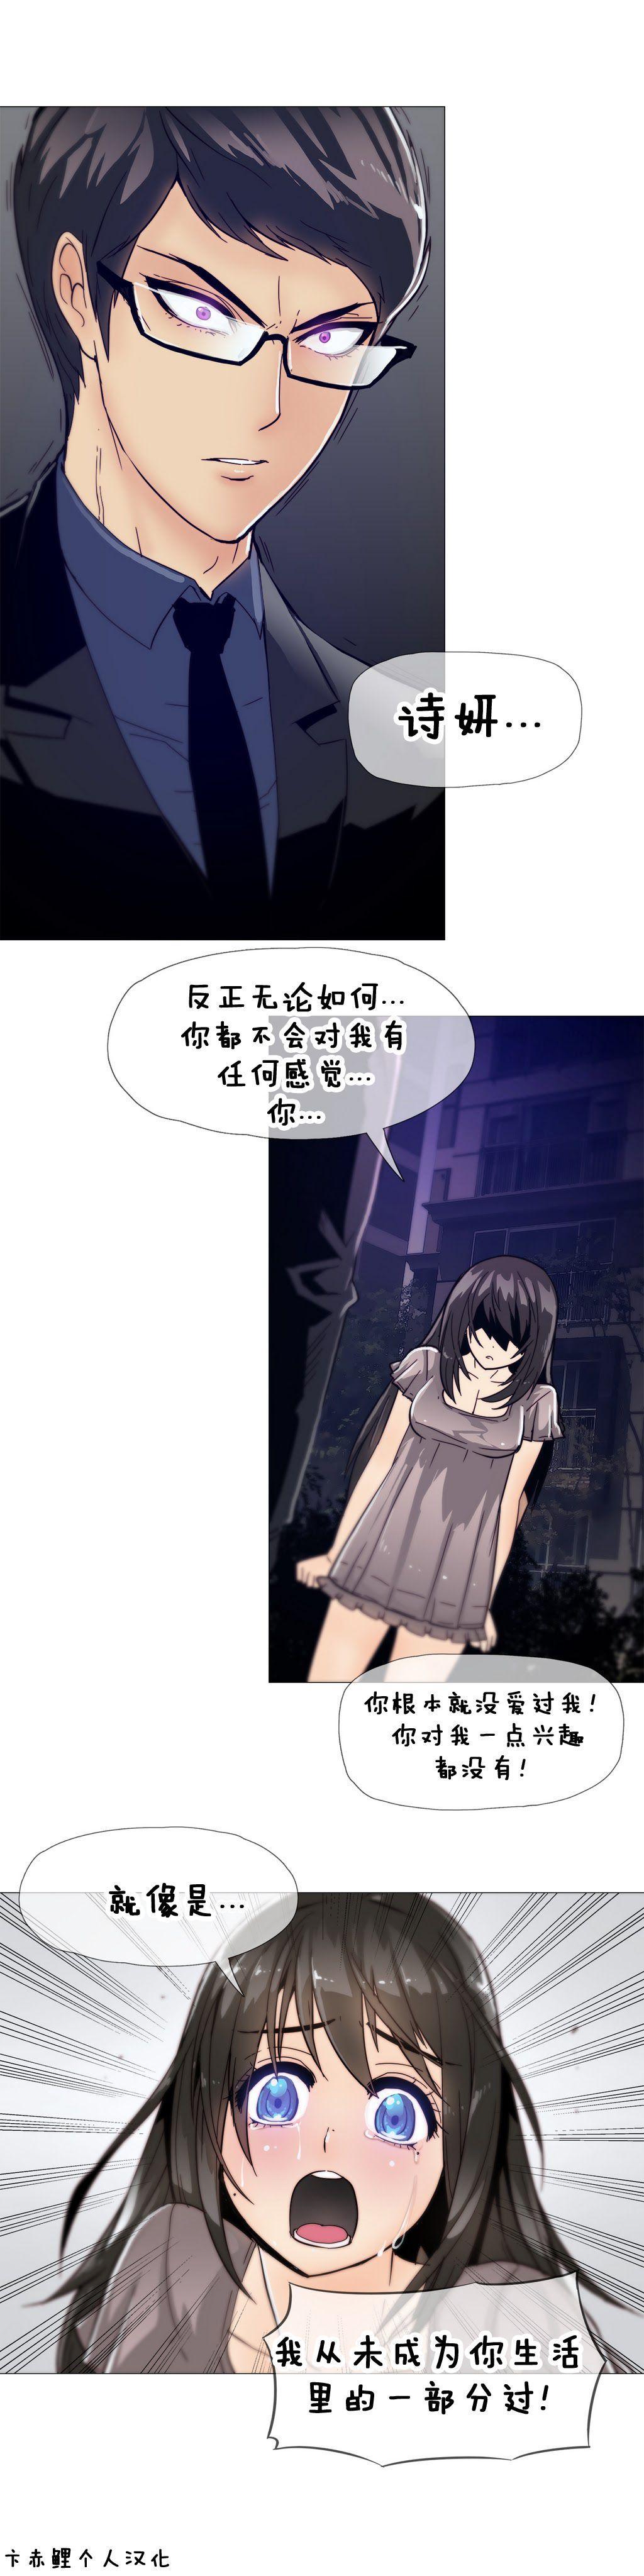 HouseHold Affairs 【卞赤鲤个人汉化】1~33话(持续更新中) 224